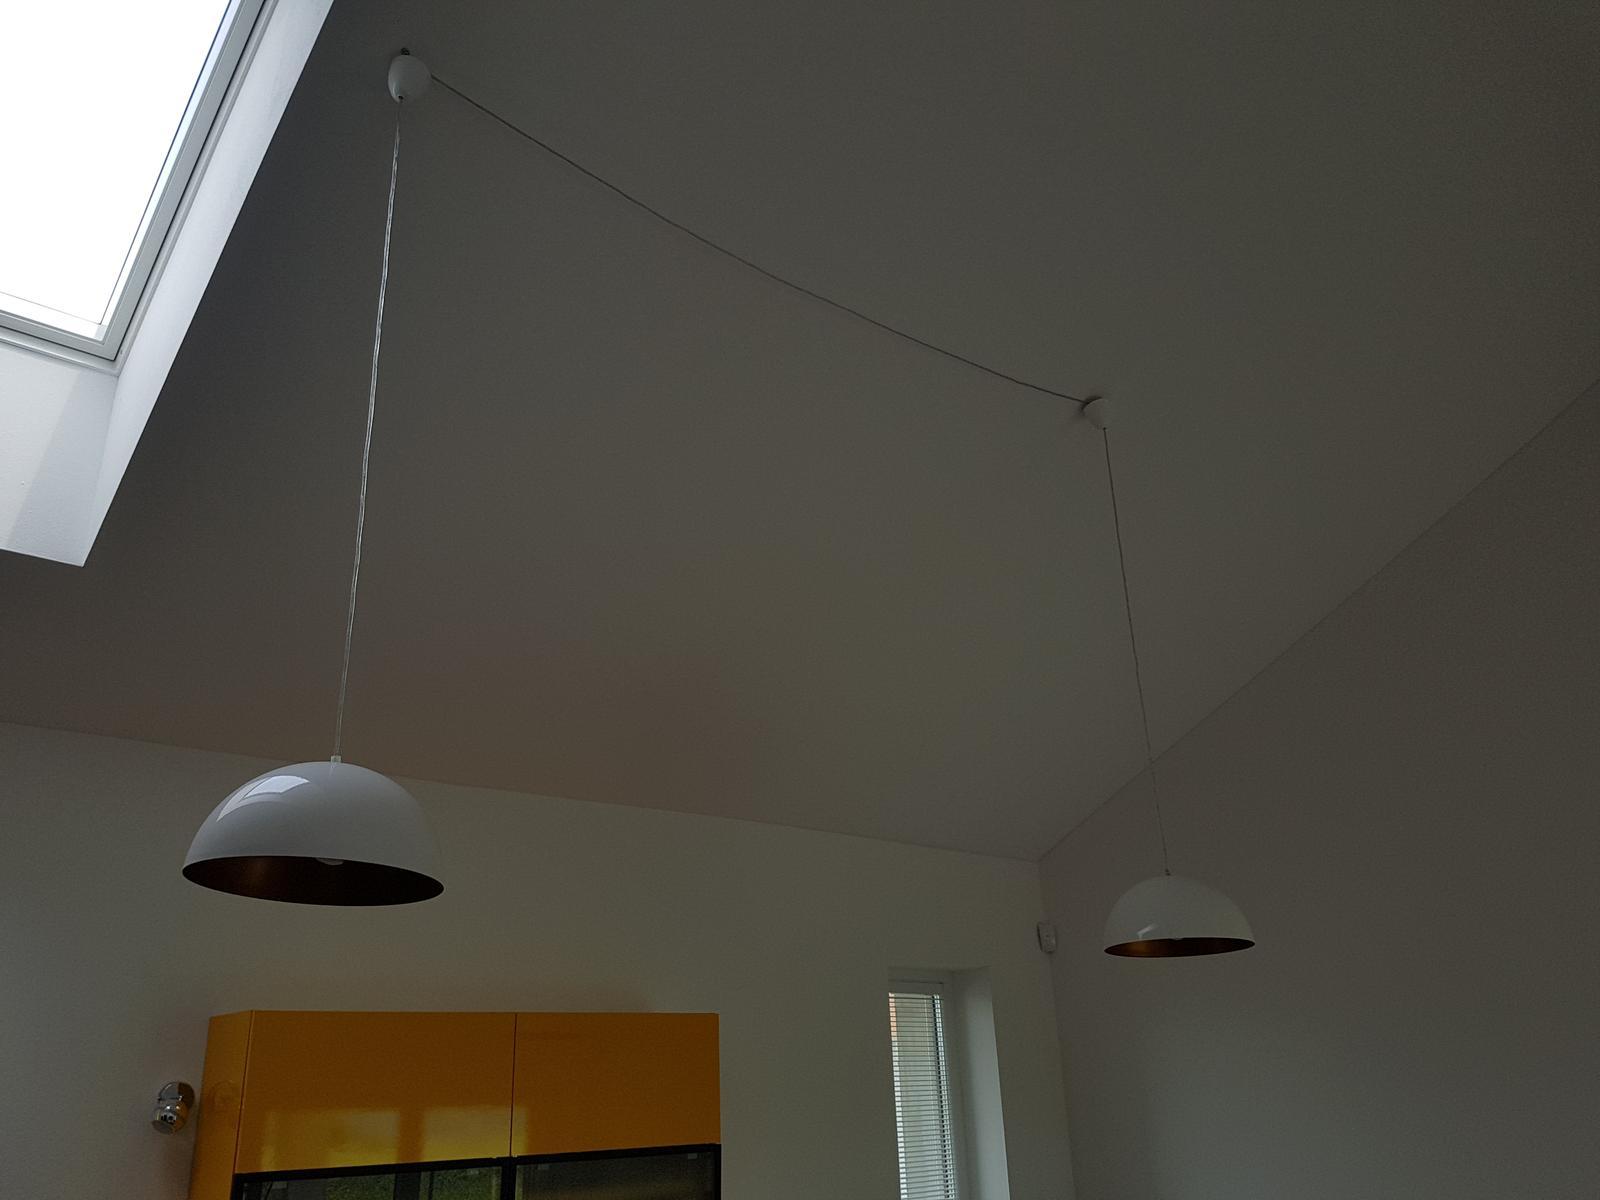 Dokoncovacie prace pred nastahovanim - zavesene svetla